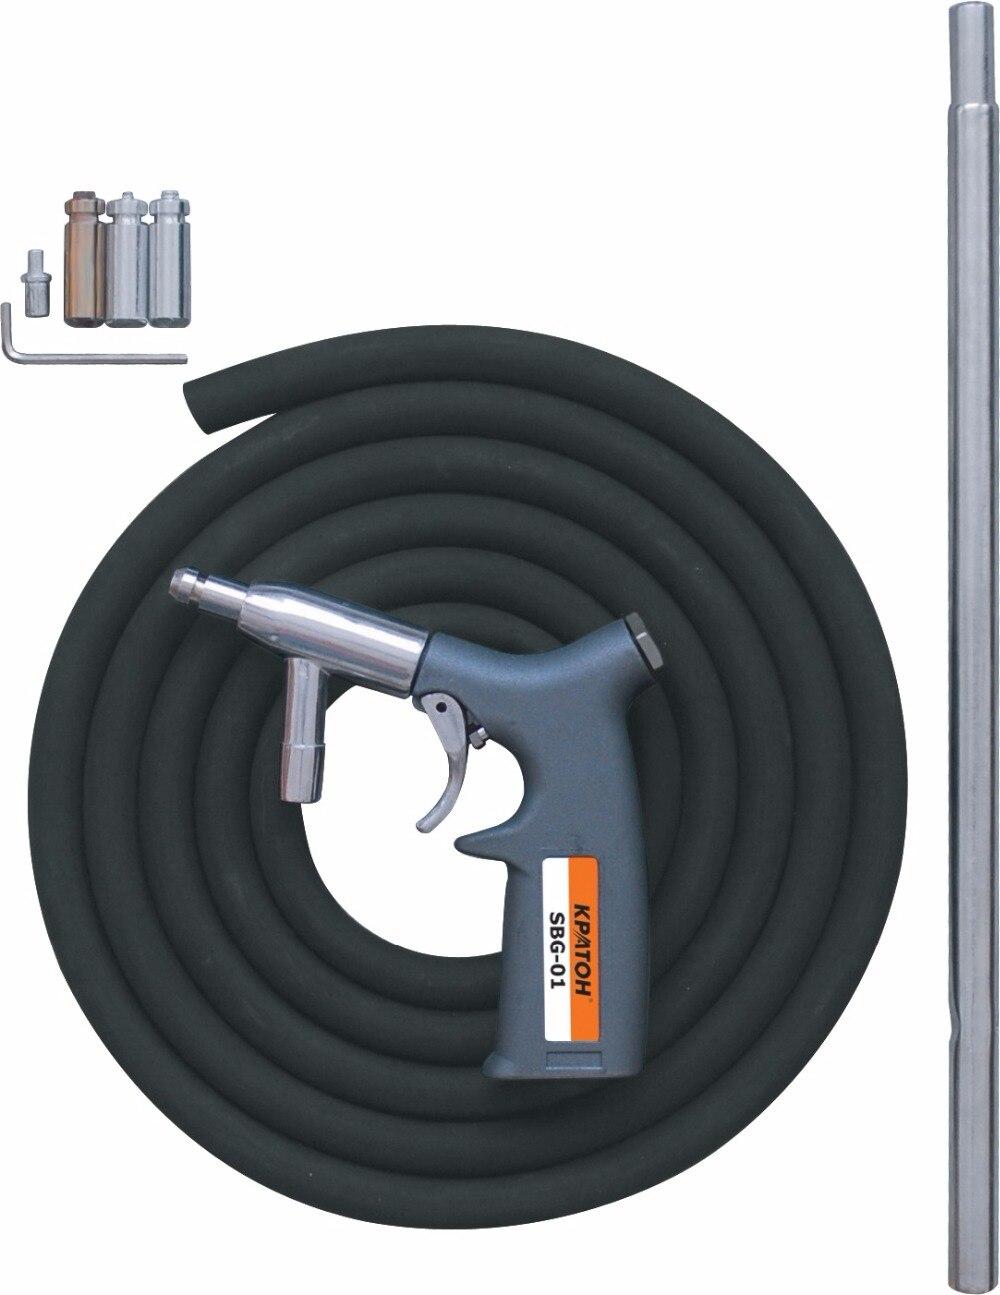 Pistol sandblasted Kraton SBG-01 pistol dispenser metal 7 positional kraton medium